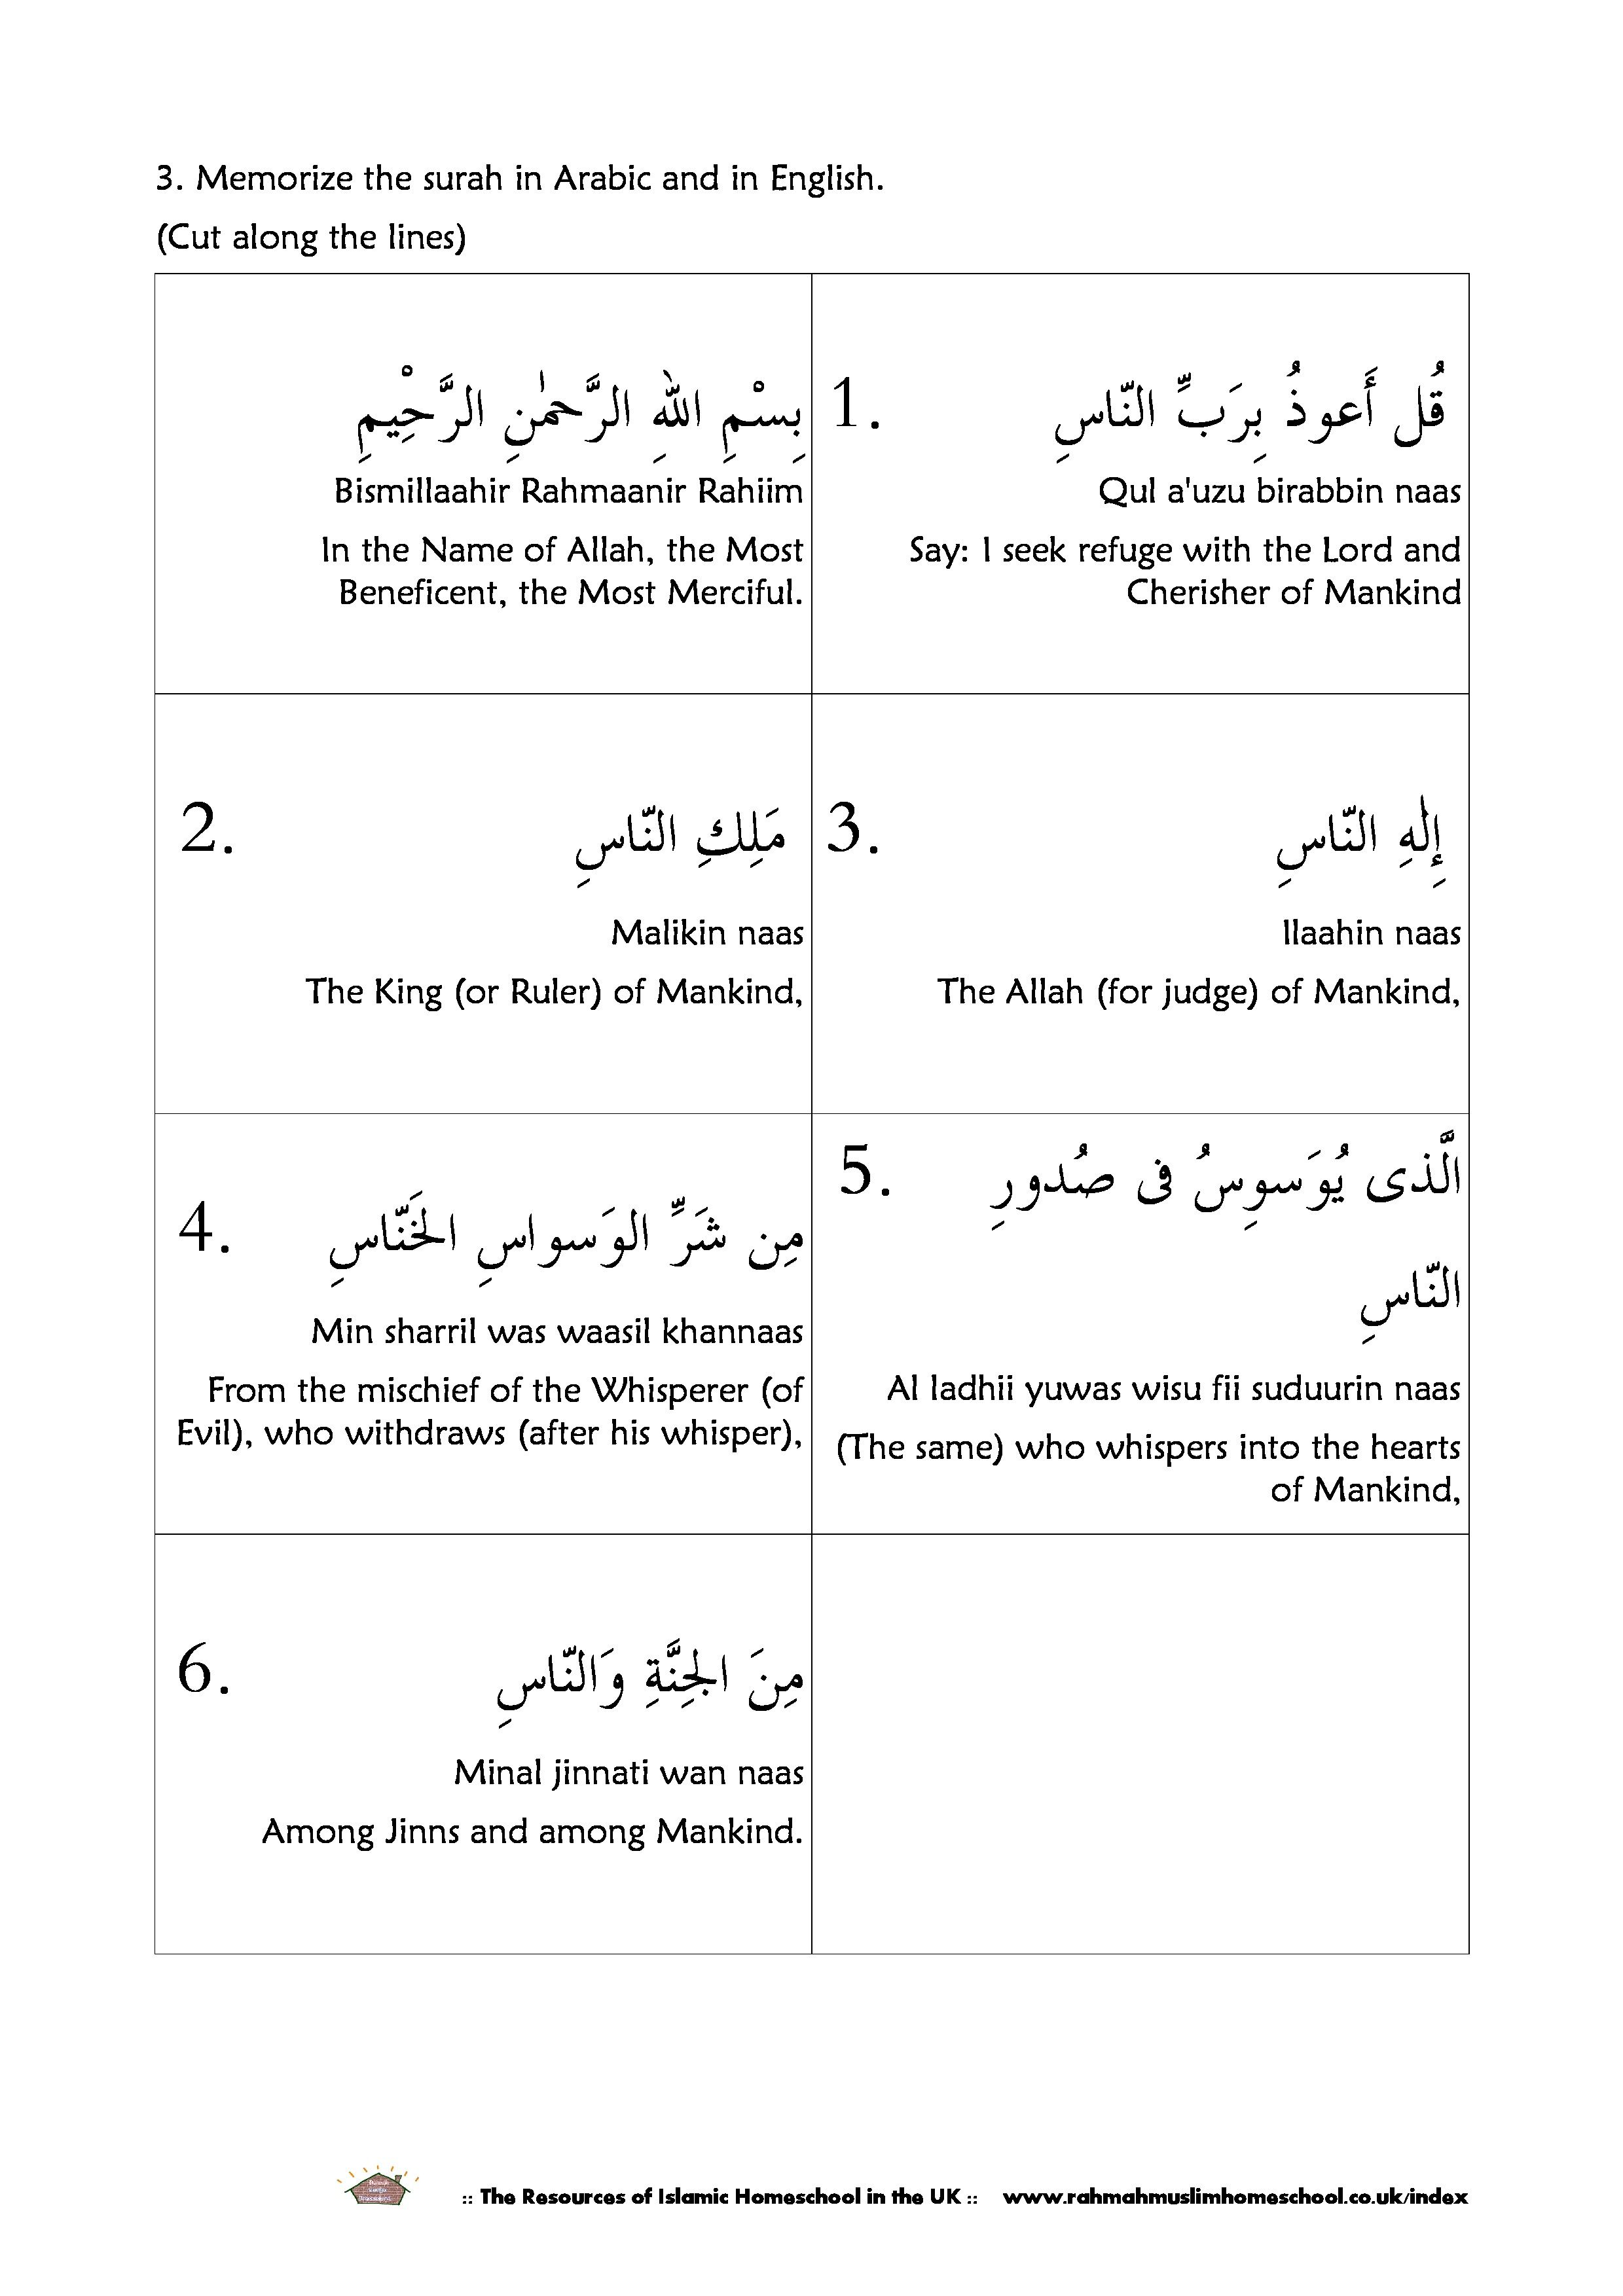 worksheet Five Pillars Of Islam Worksheet surah an nas the mankind worksheet beauty of islam pinterest worksheet